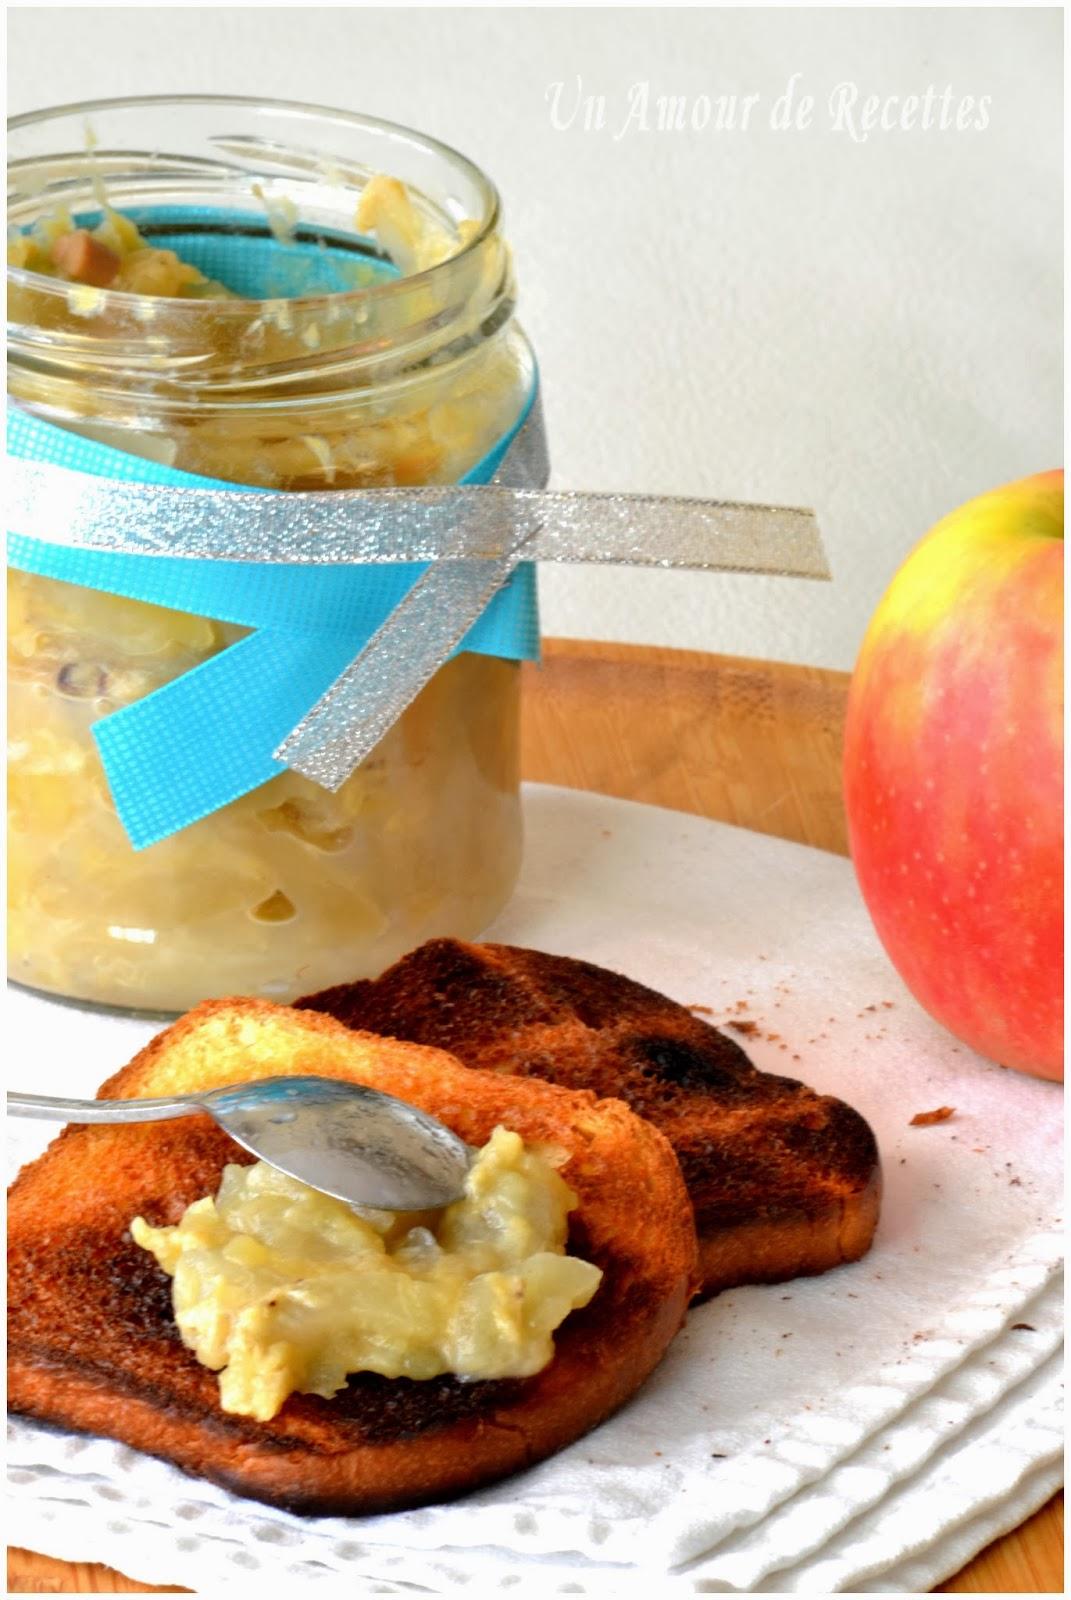 compote de pommes banane et f ve tonka blogs de cuisine. Black Bedroom Furniture Sets. Home Design Ideas